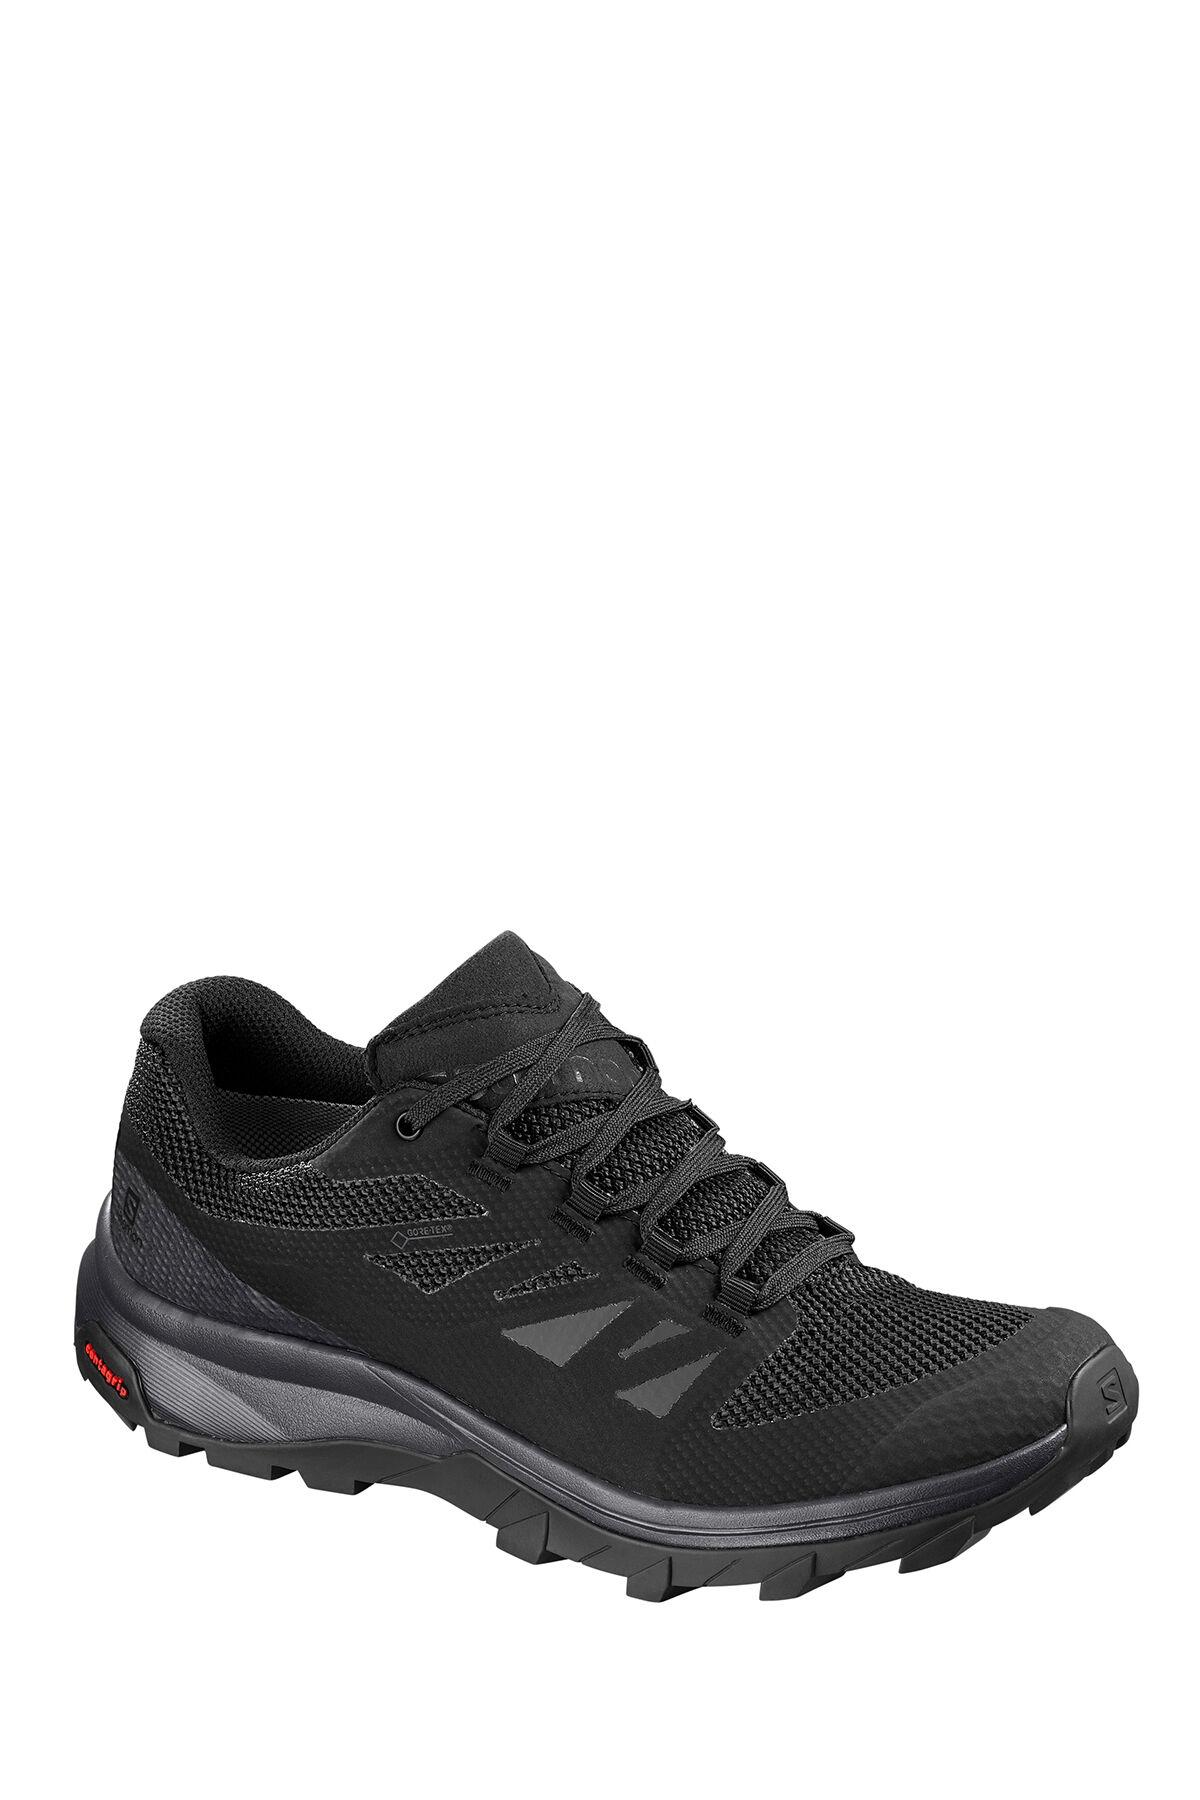 salomon outline gtx hiking shoes - women's diamond